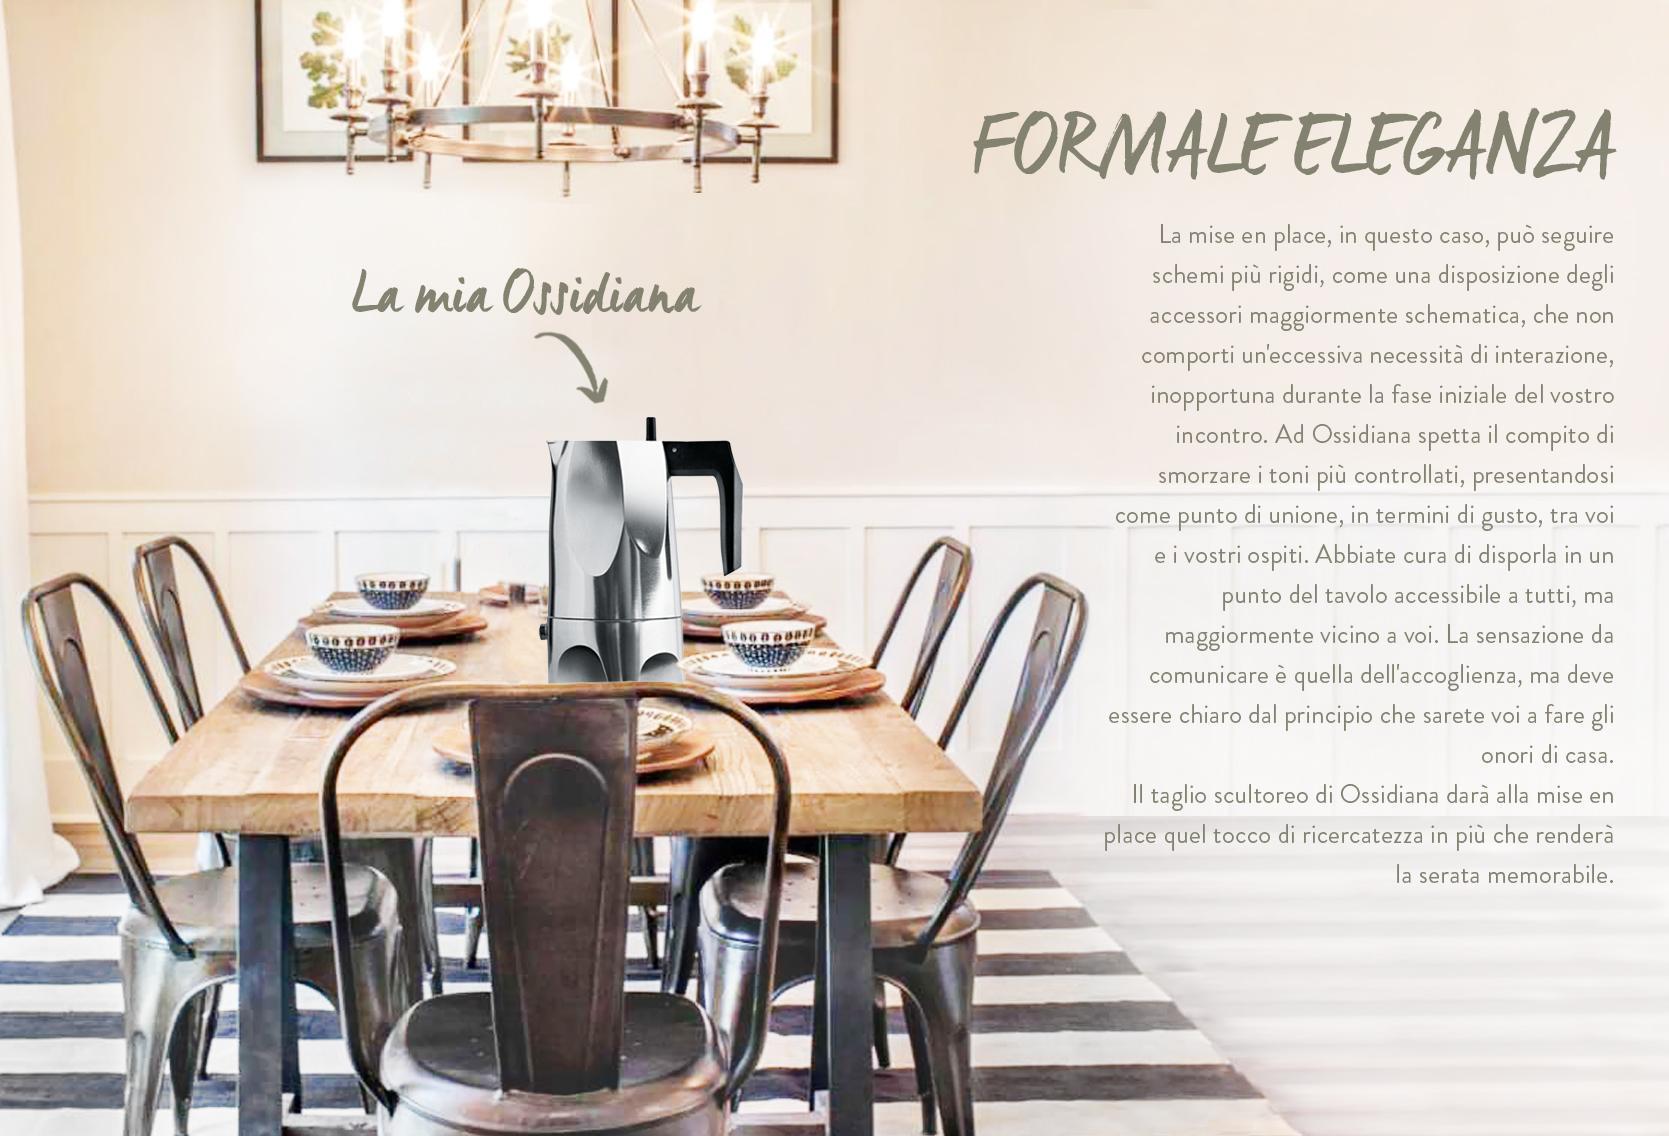 Alessi, Ossidiana, Moka, Design, Caffè, Mise en place